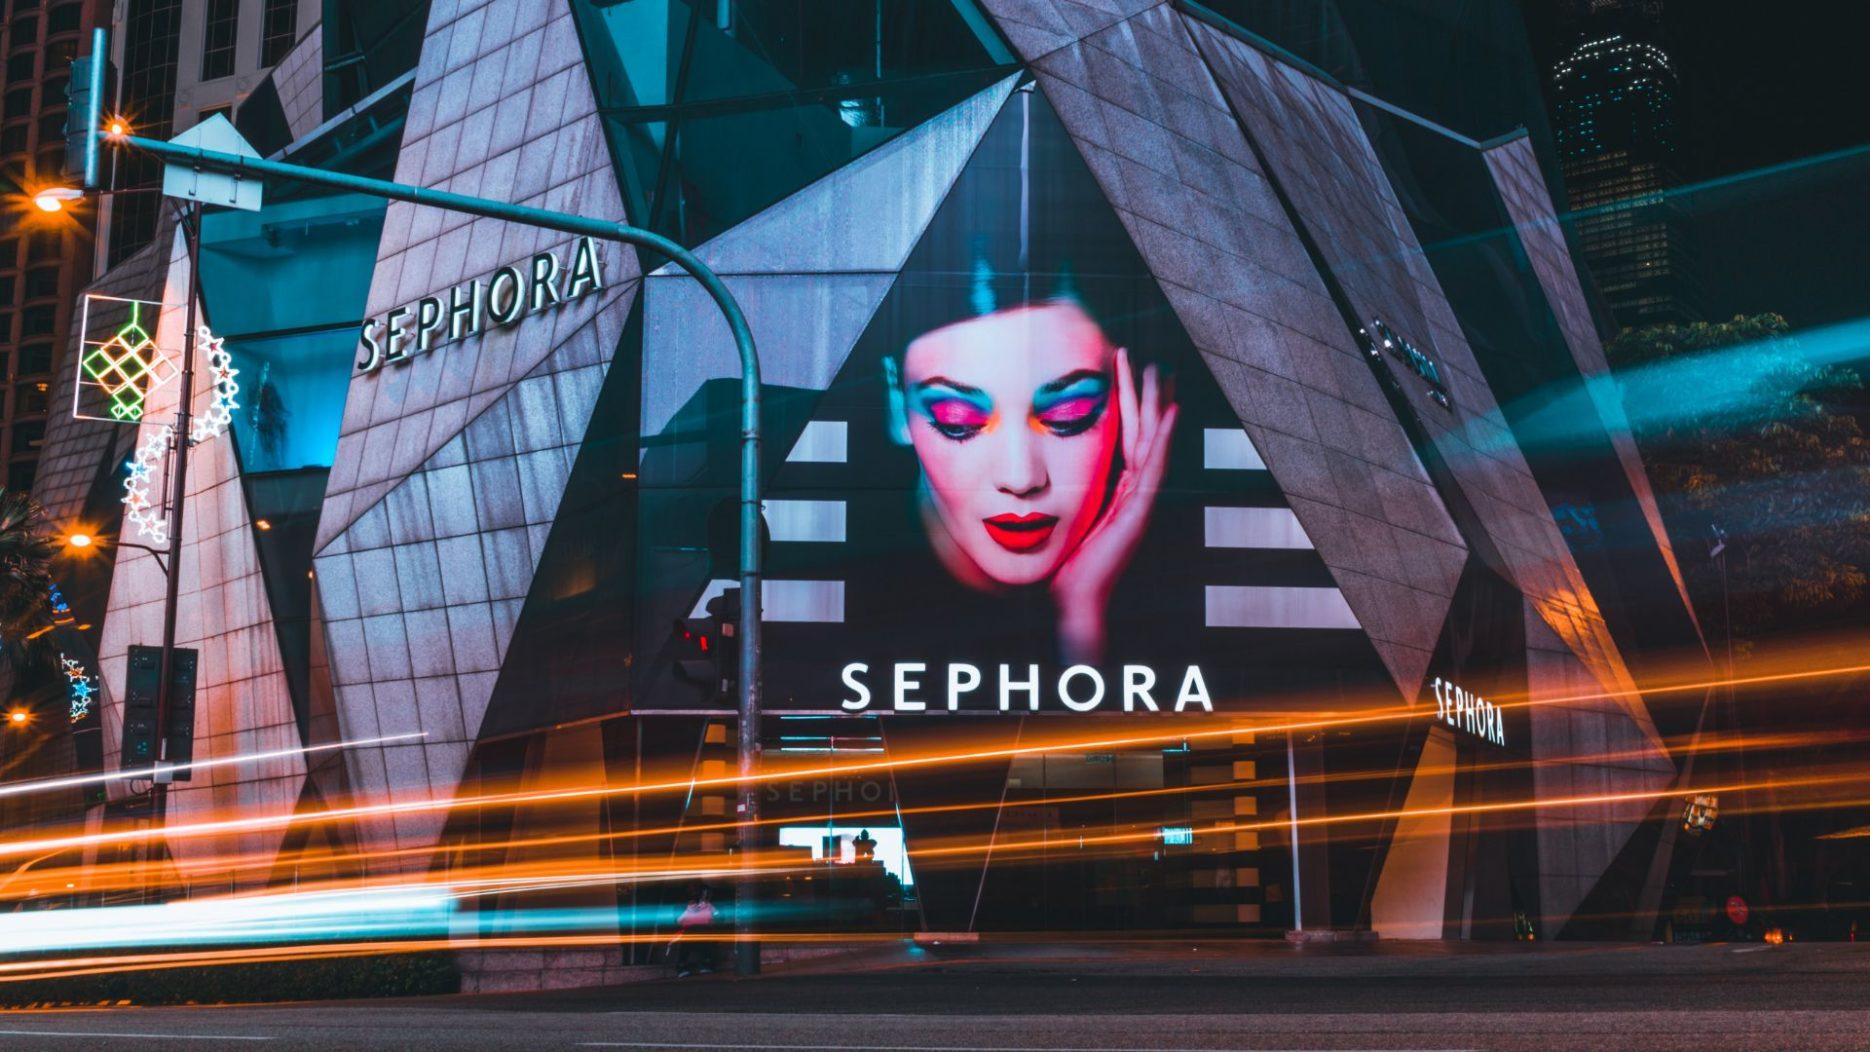 Make-up brands Sephora store